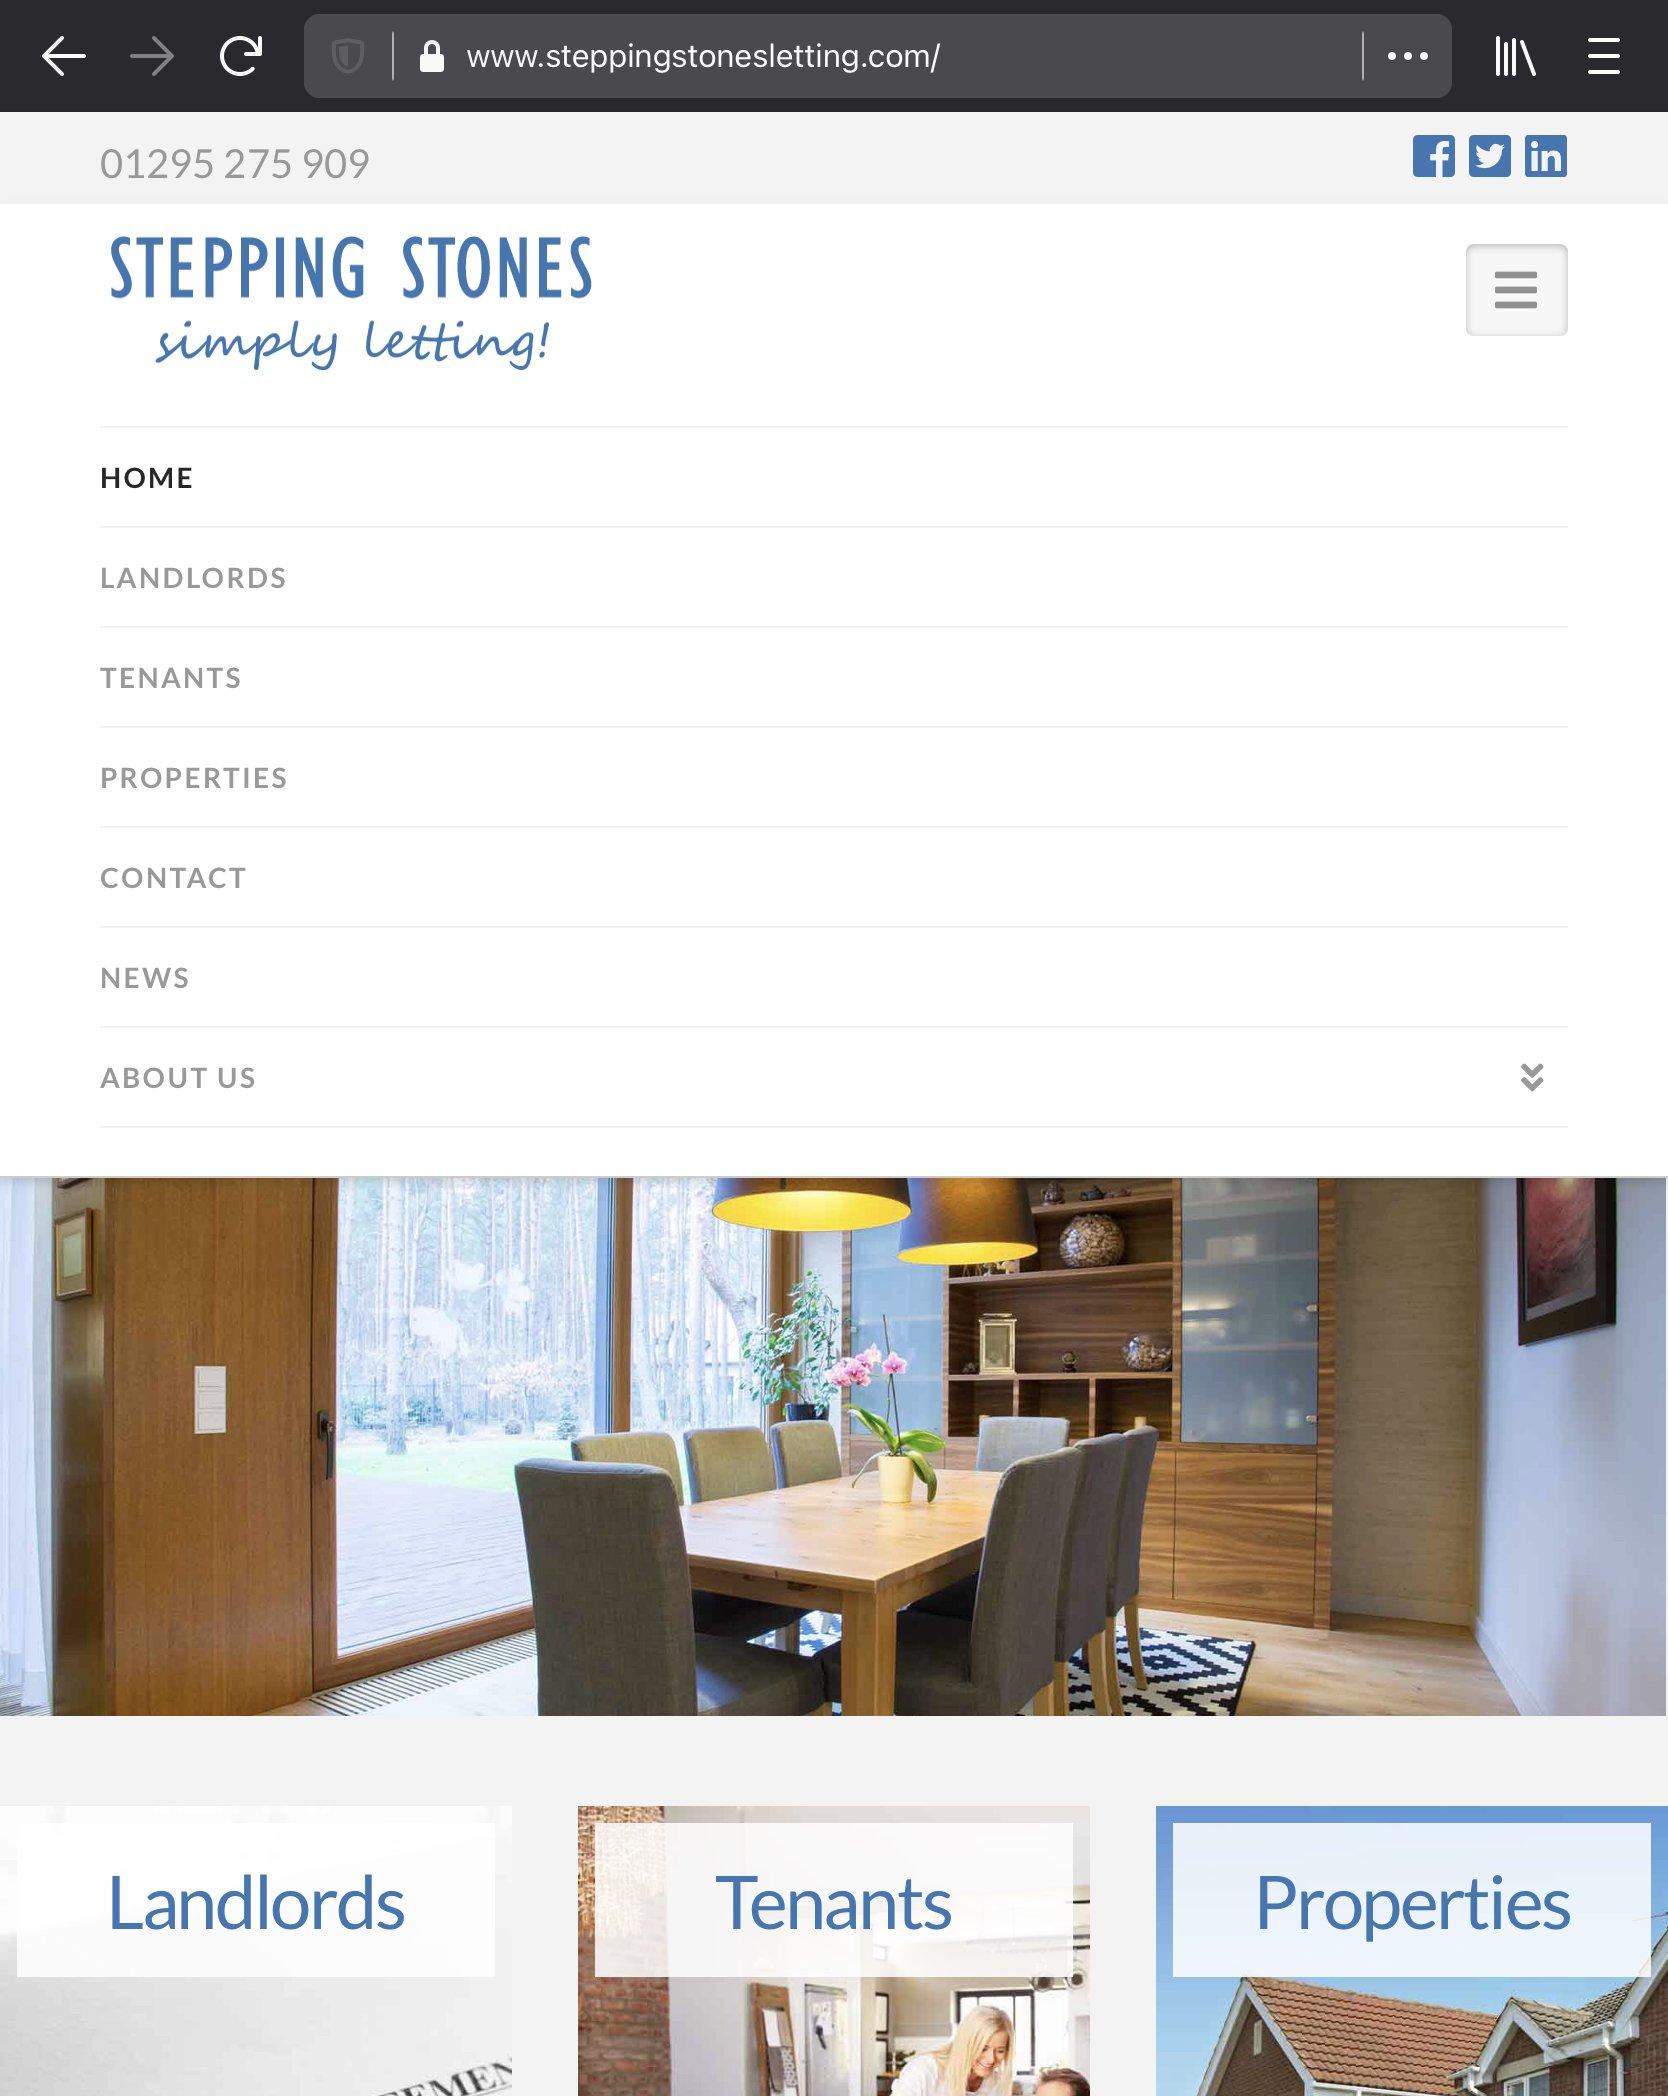 steppingh stones letting website homepage mobile menu